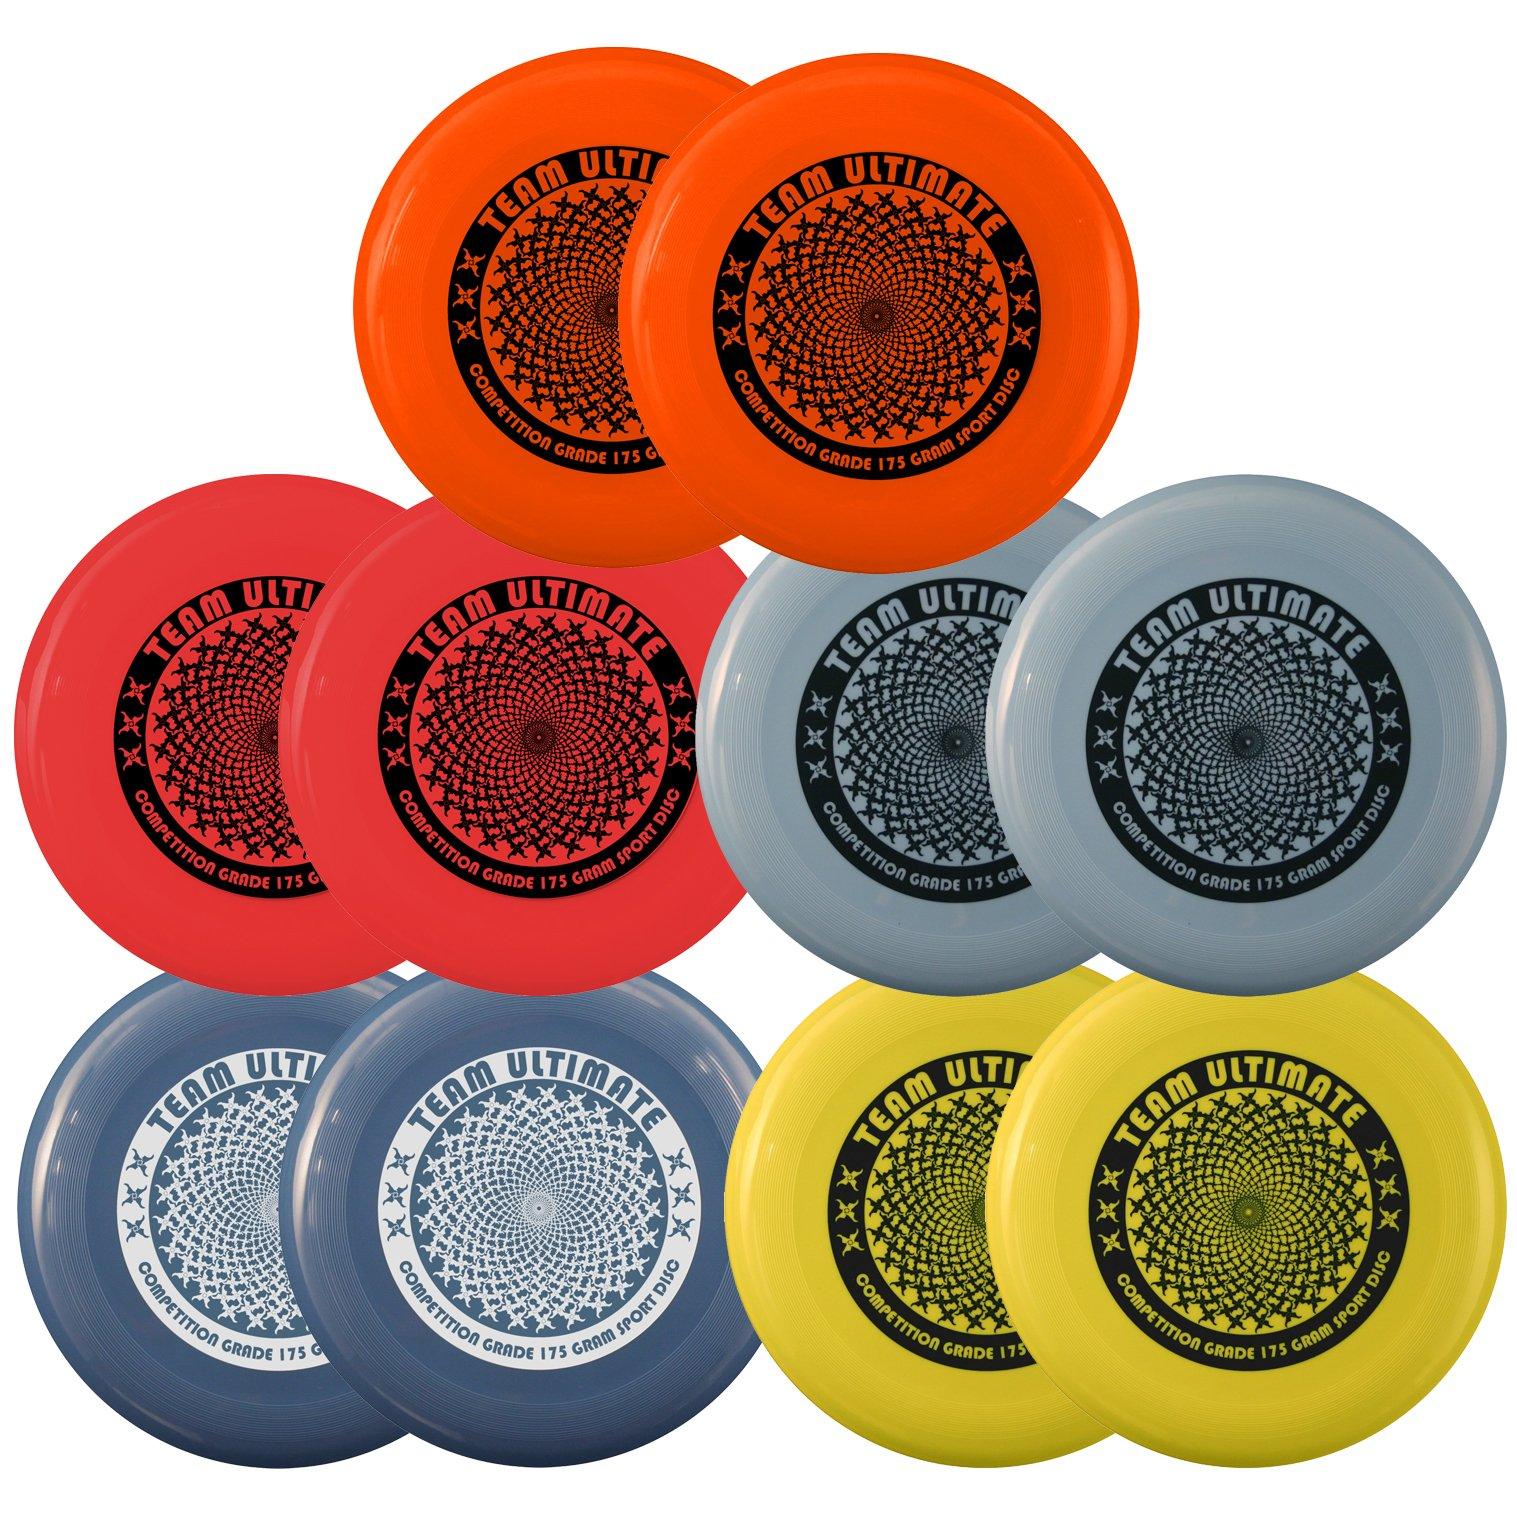 Pack of 10 Da Vinci Team Ultimate 175 Gram, 10.75 Inch Flying Sport Discs, 5 Colors by Da Vinci